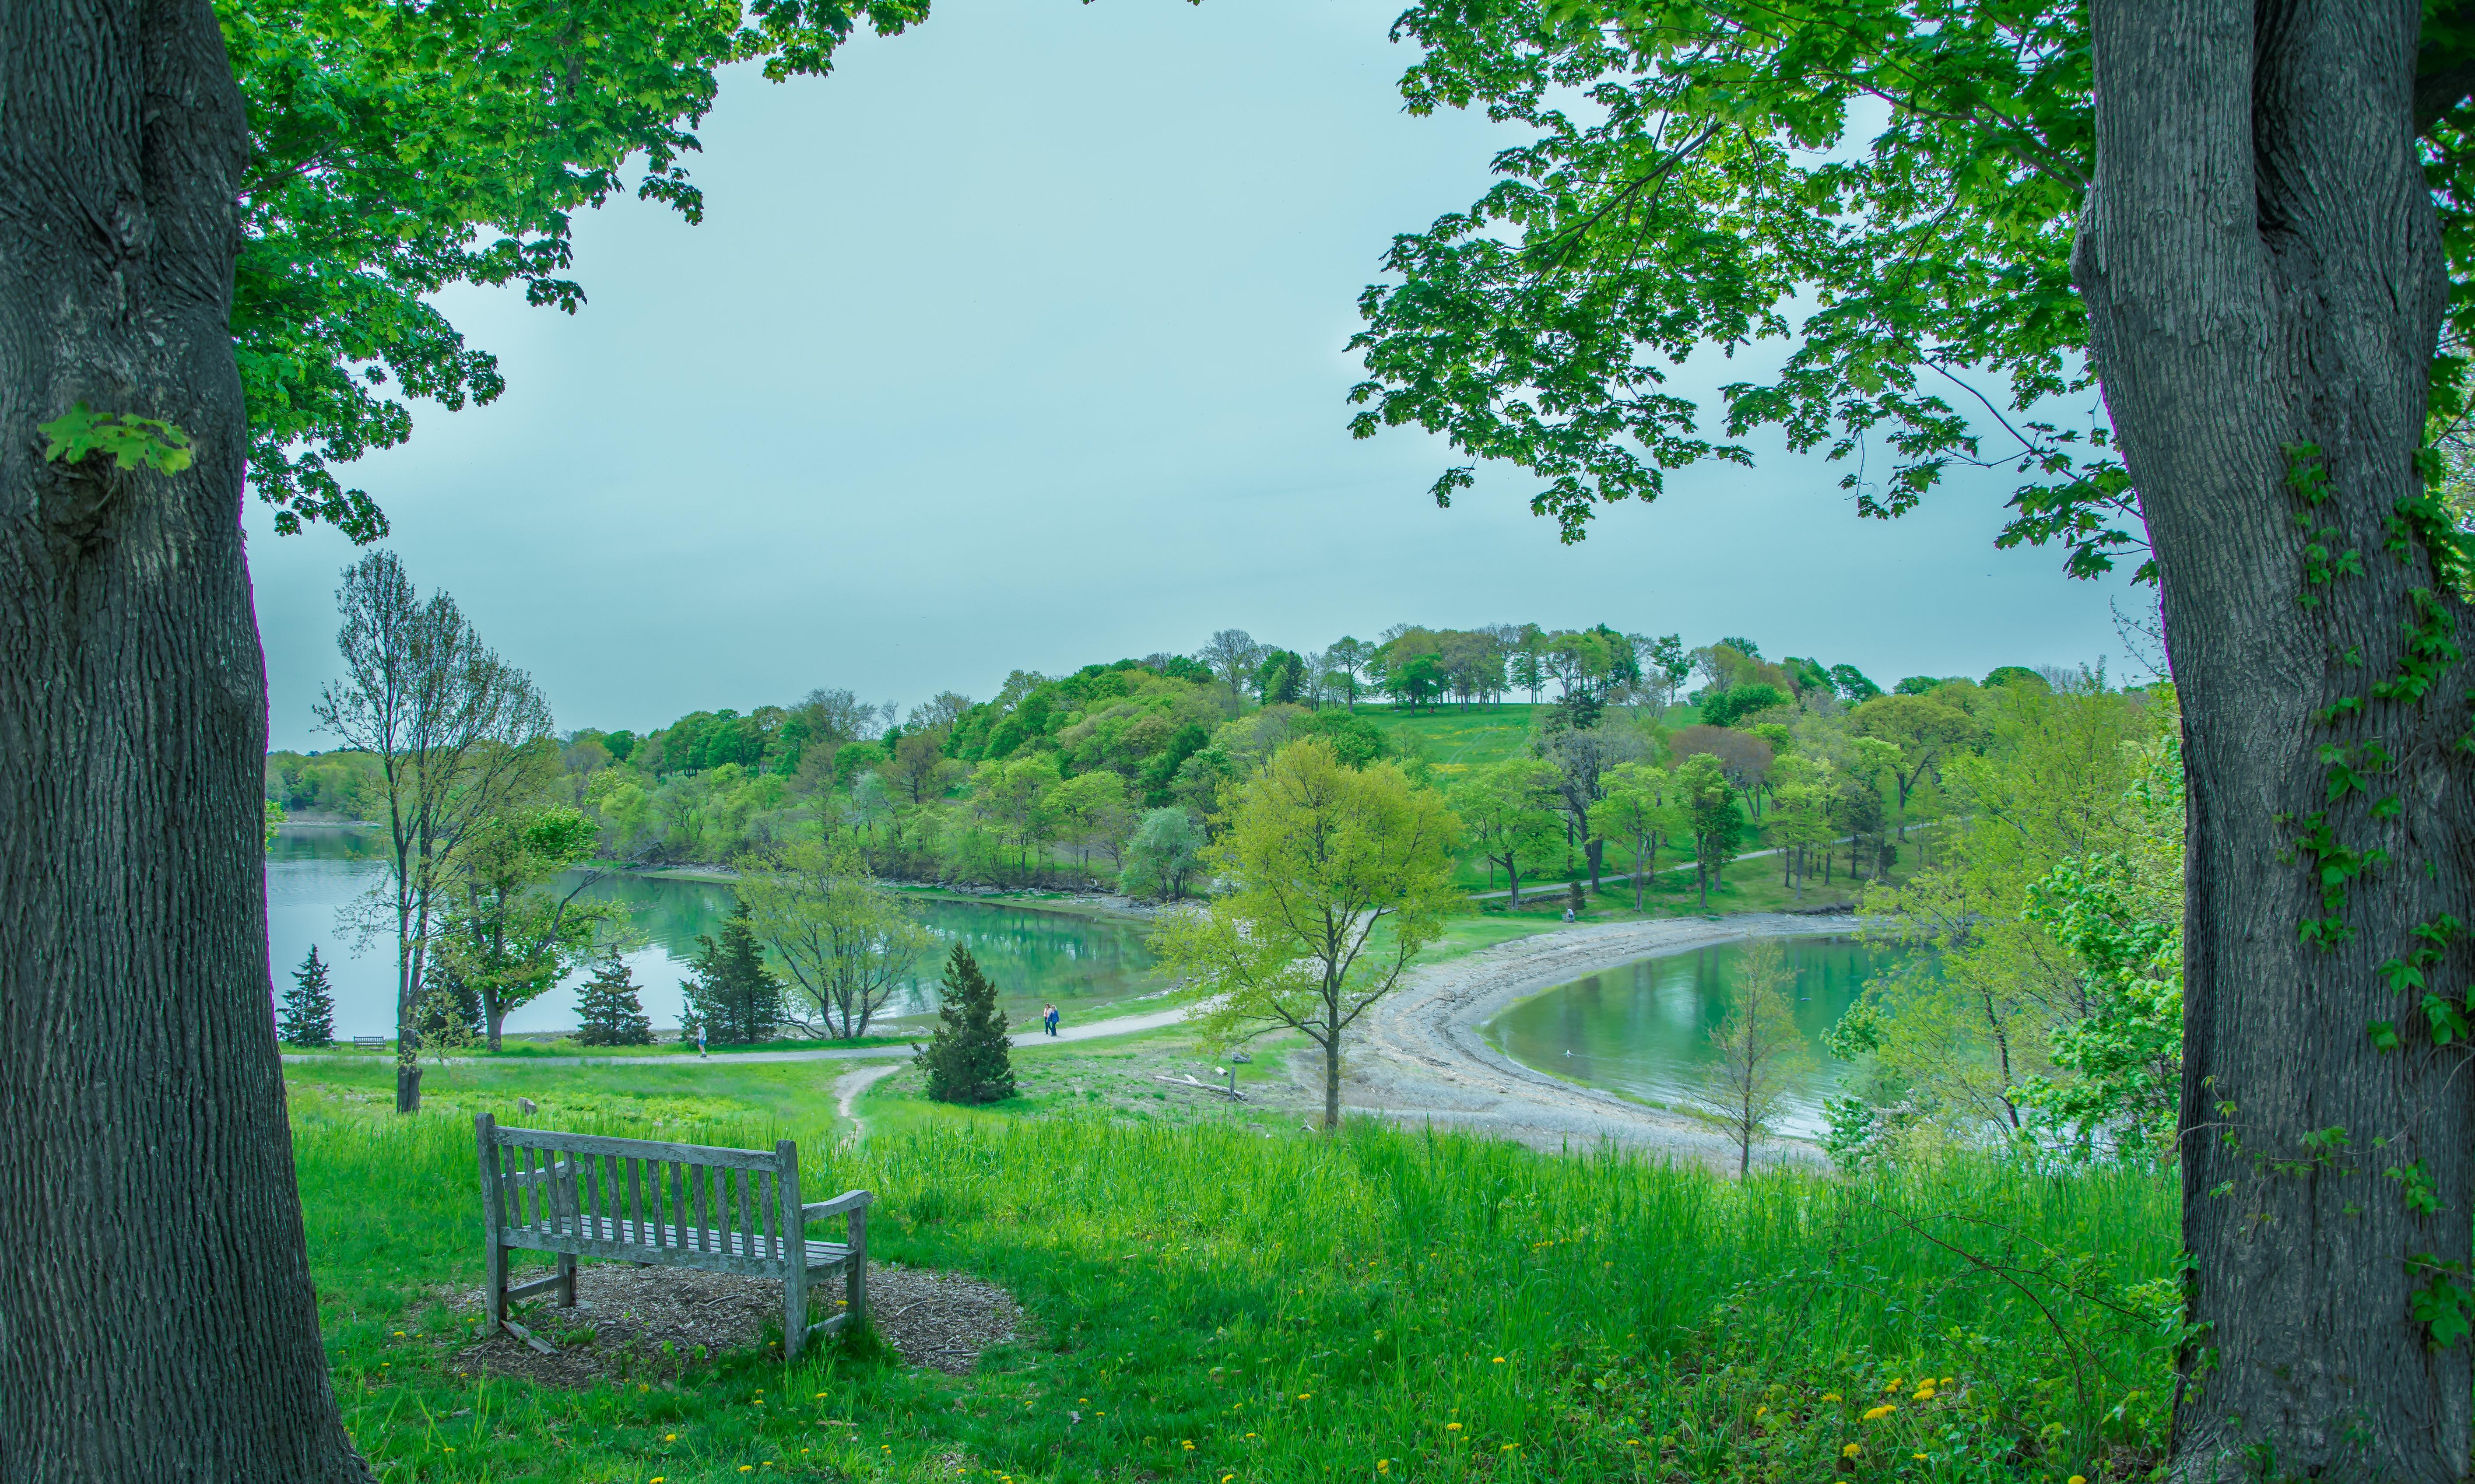 Новая Англия, скамейка, клены